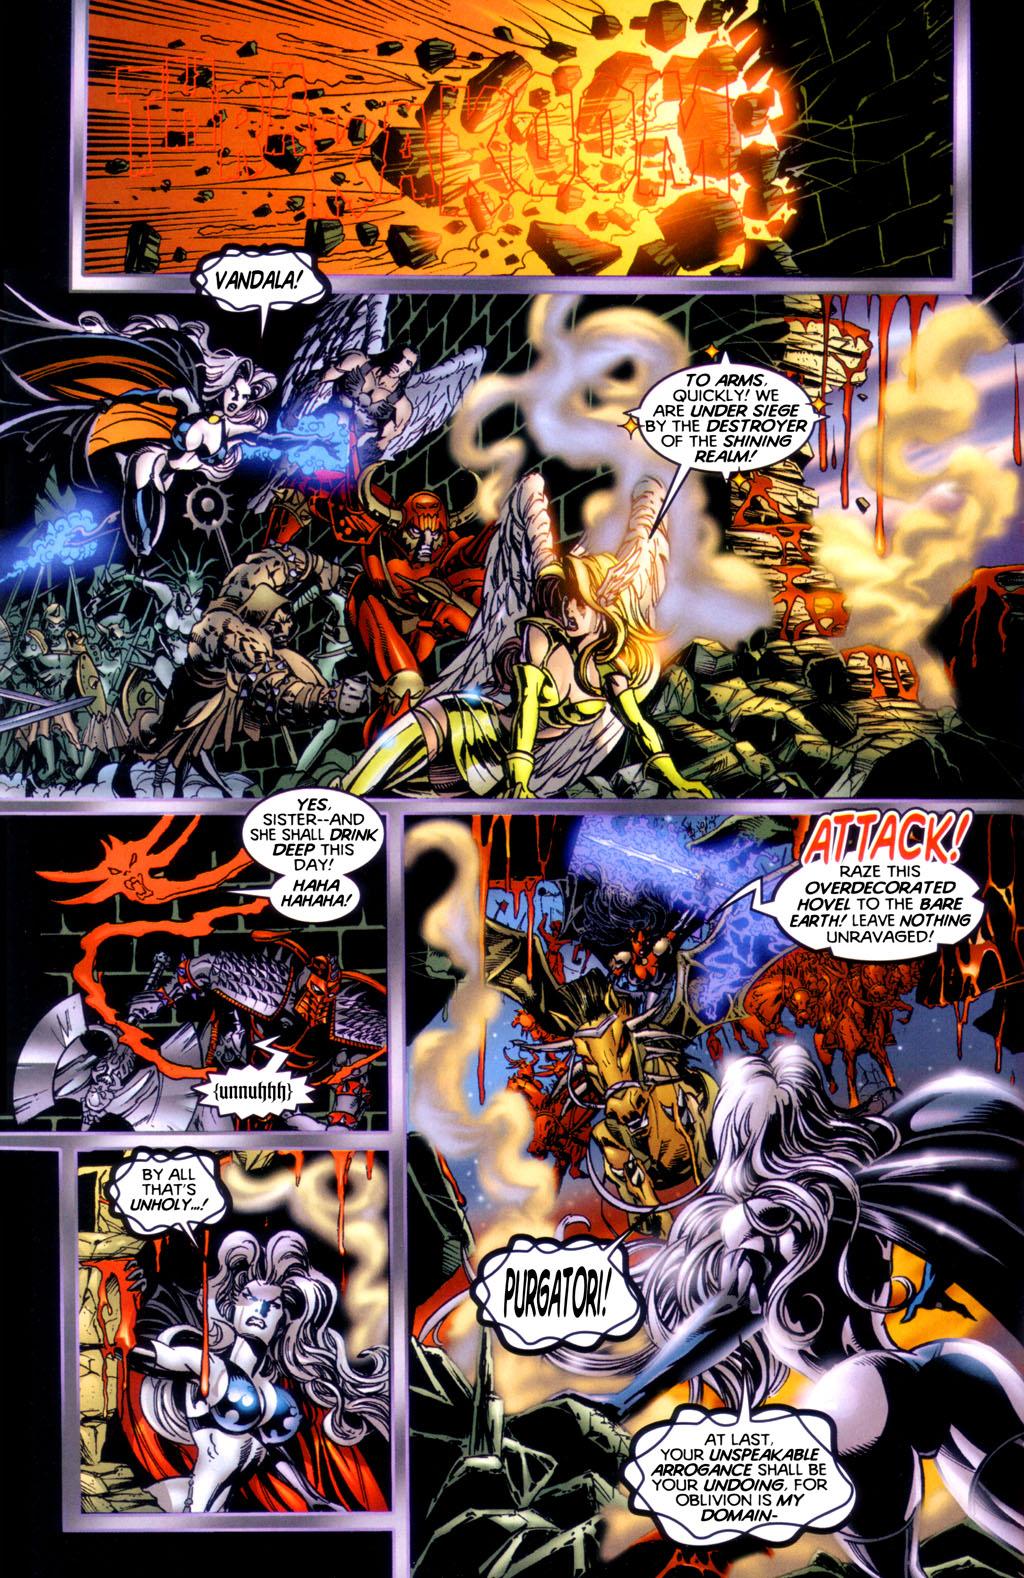 Read online Lady Death vs. Purgatori comic -  Issue # Full - 7